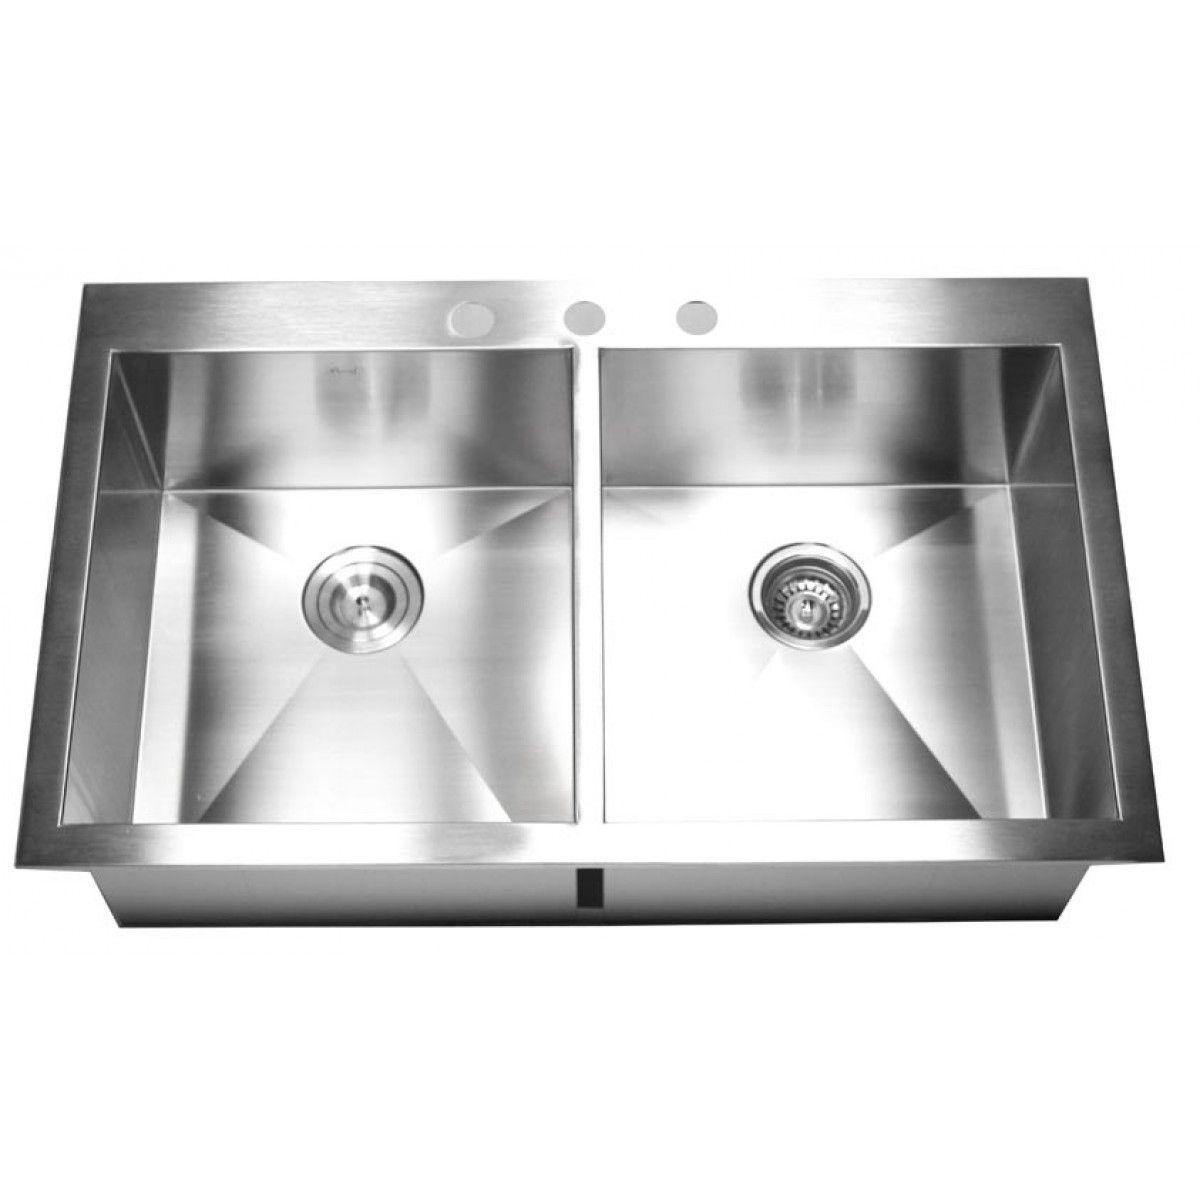 Stainless Steel Kitchen Sinks Top Mount Double Bowl | http://yonkou ...